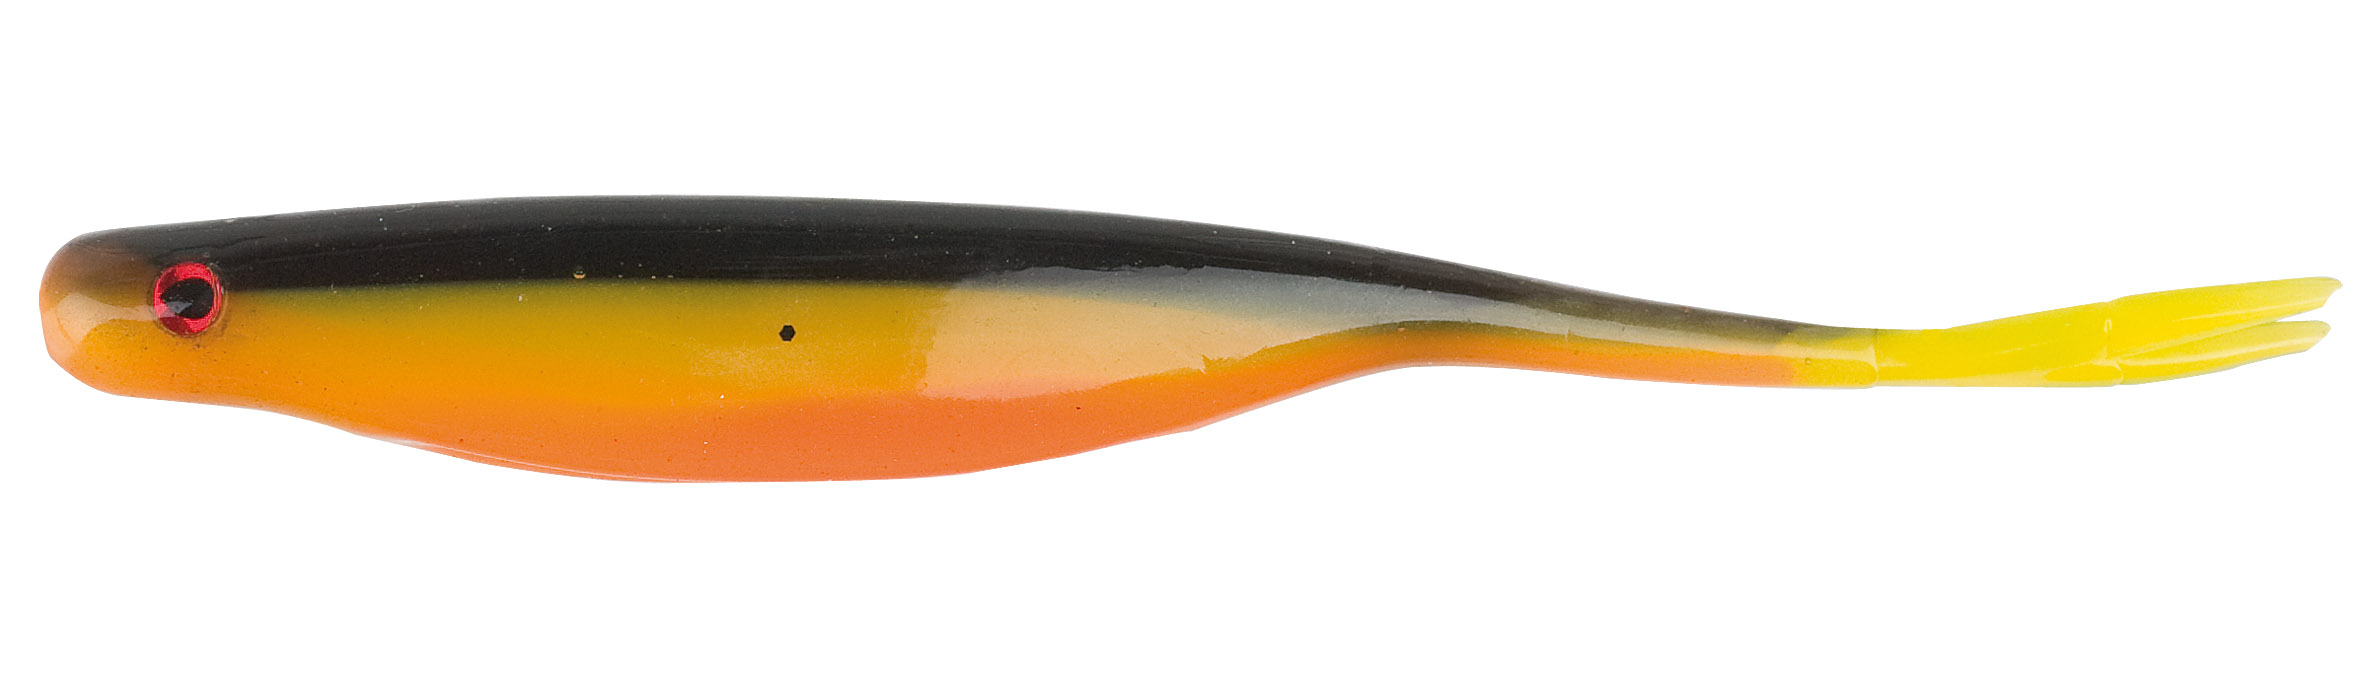 Iron Claw gumová nástraha Premium Split Tail 10 cm Vzor RP, 4ks/bal